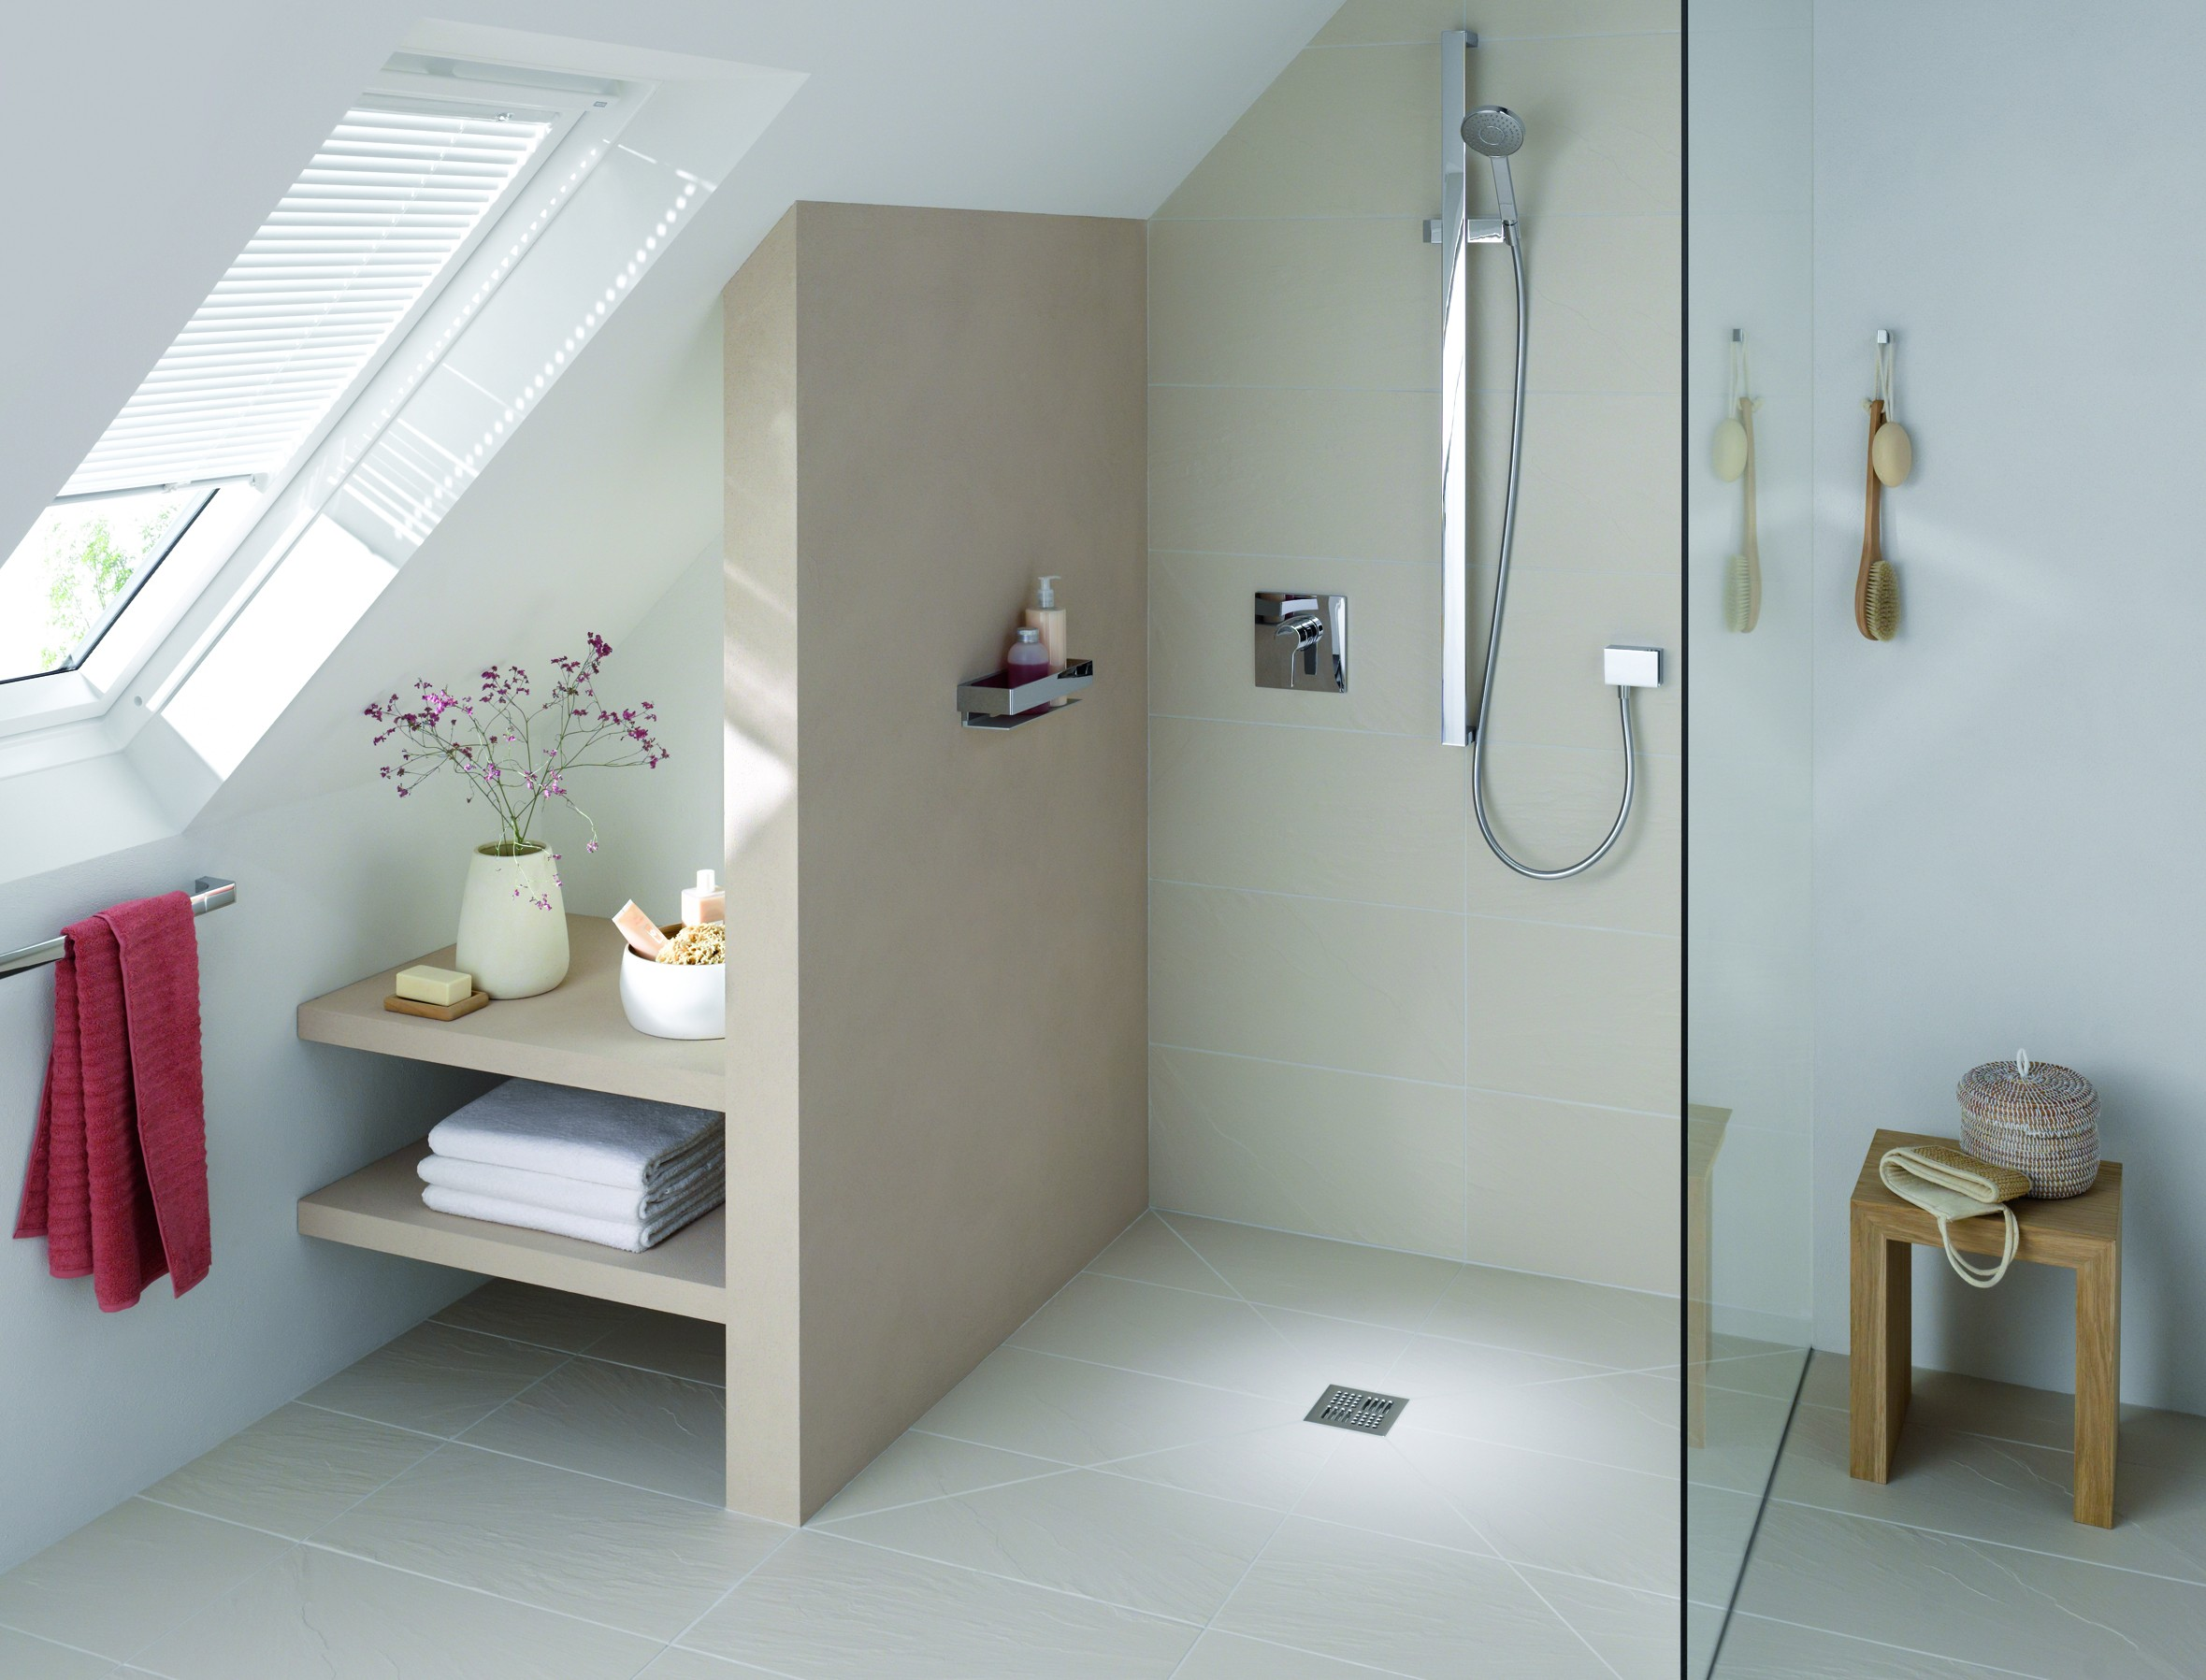 Badezimmer 7 Qm